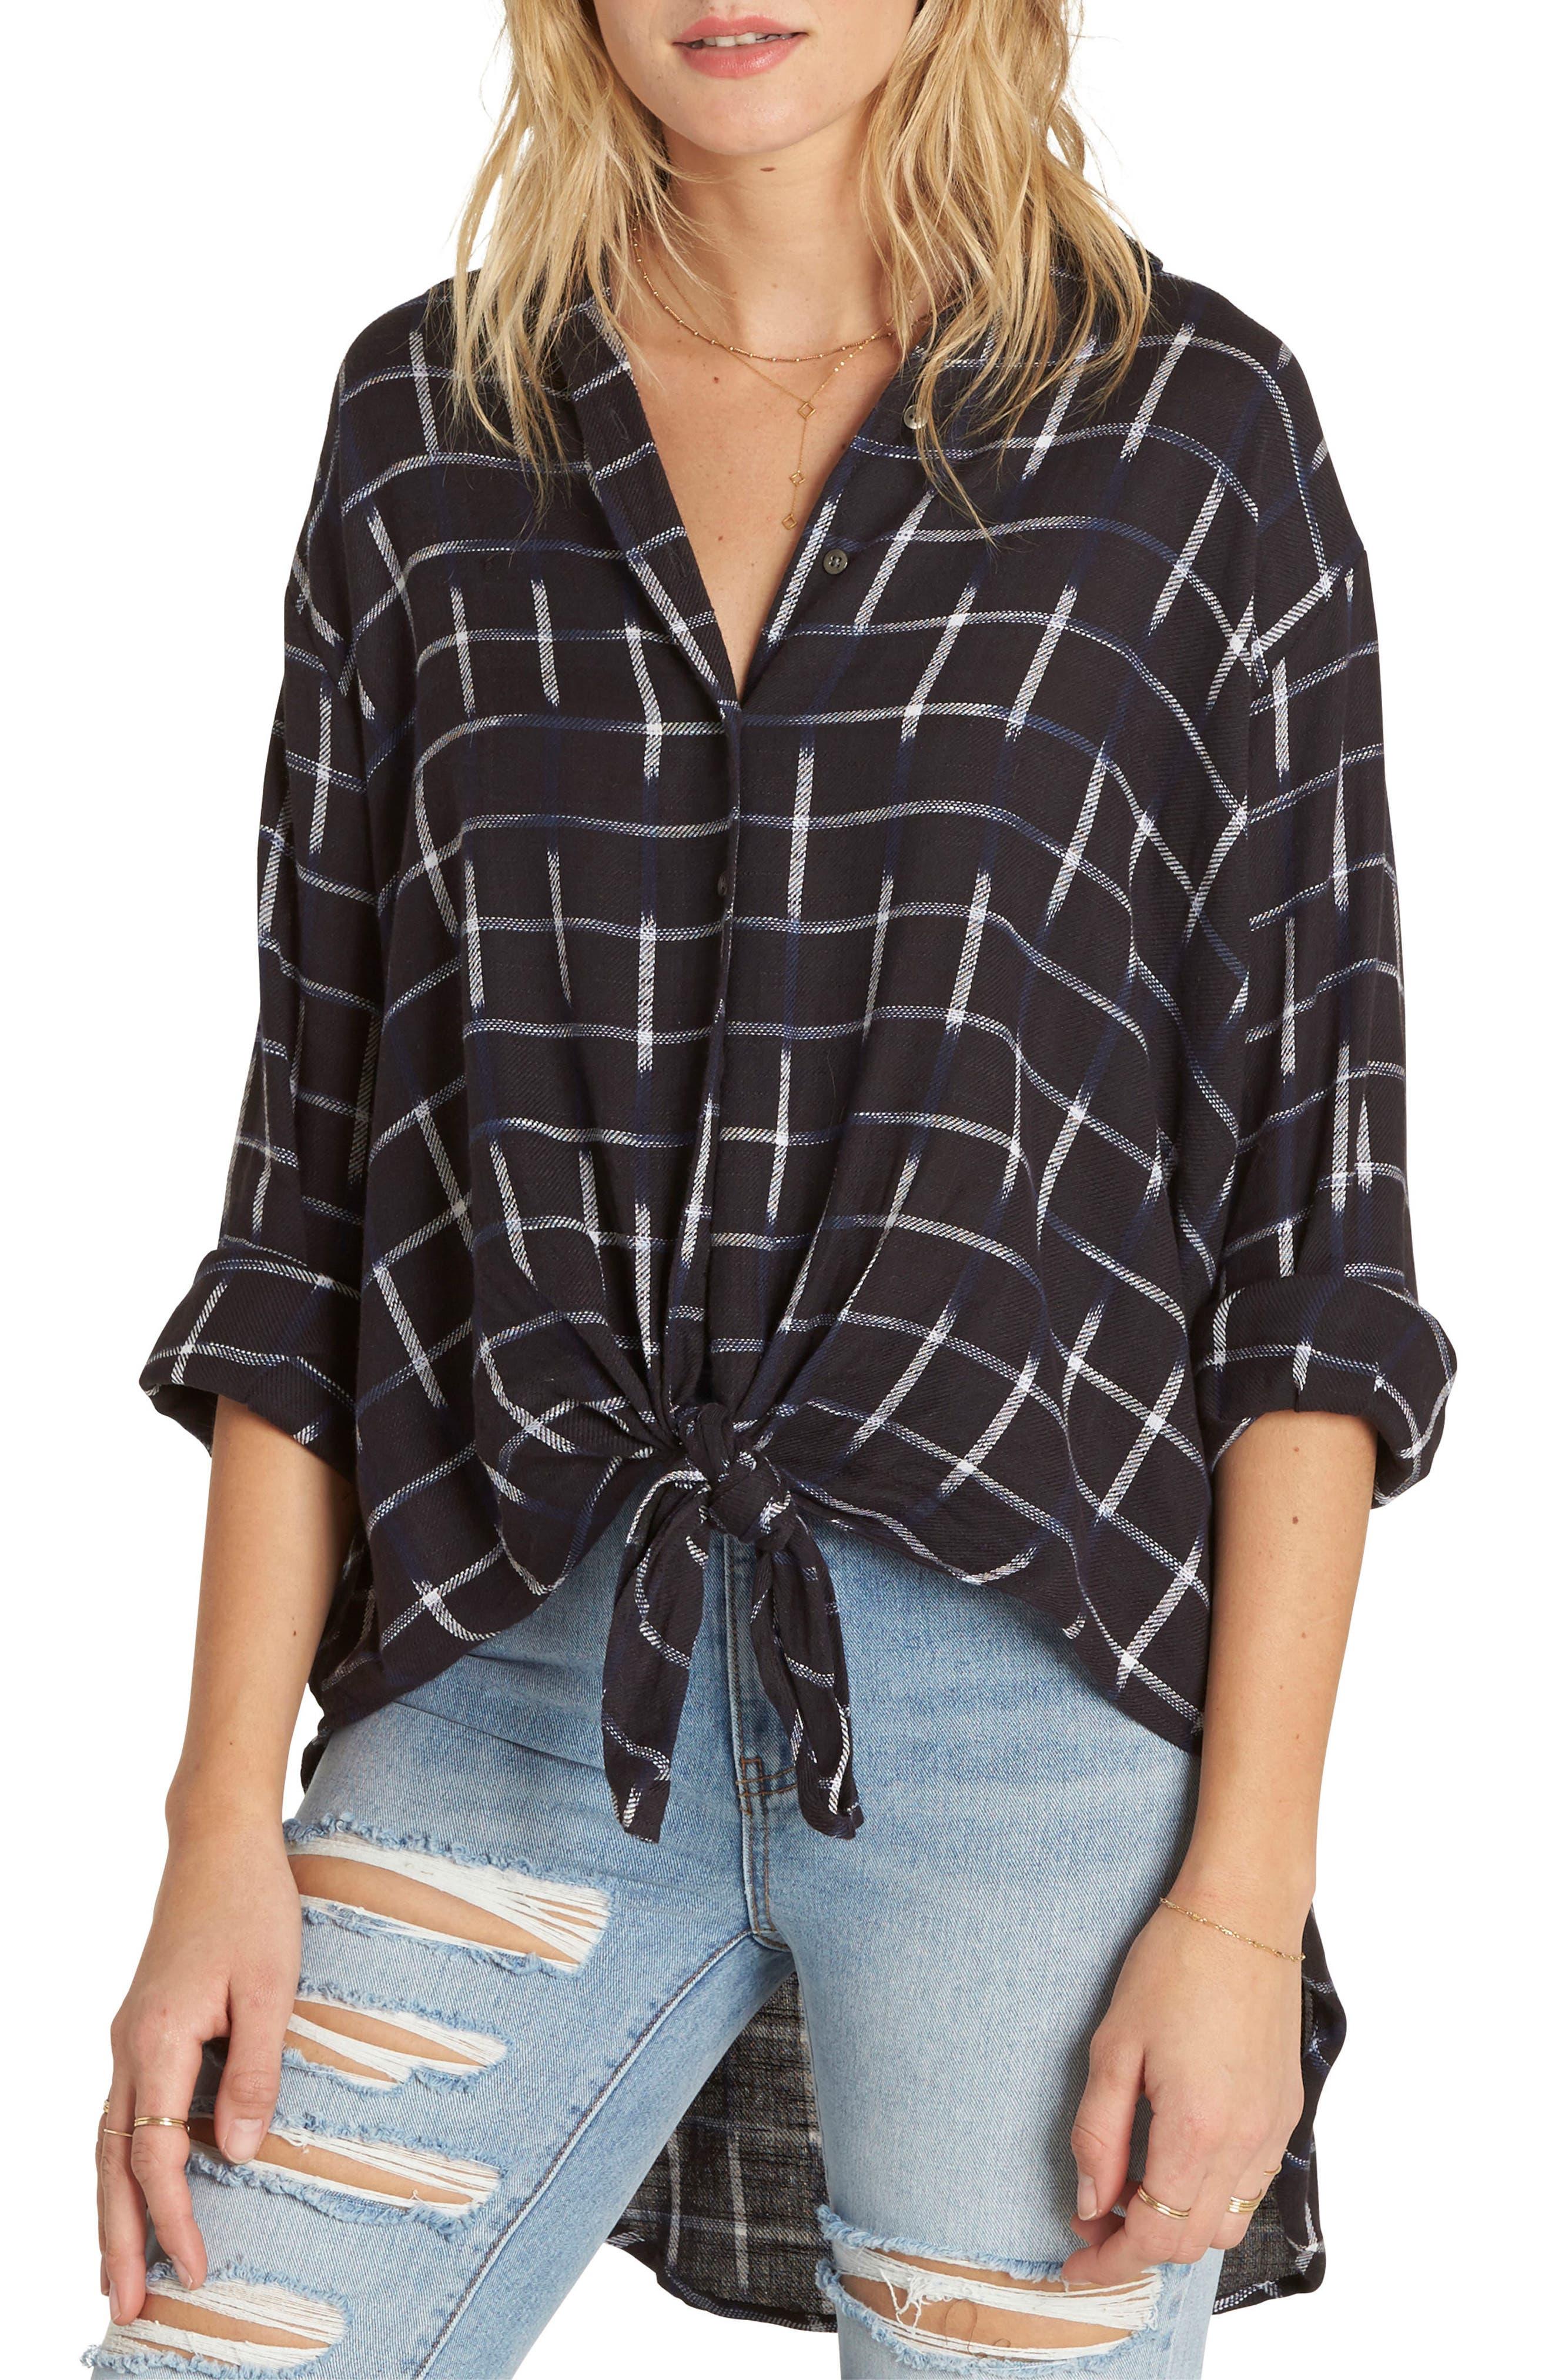 Alternate Image 1 Selected - Billabong Cozy Nights Tie Front Shirt